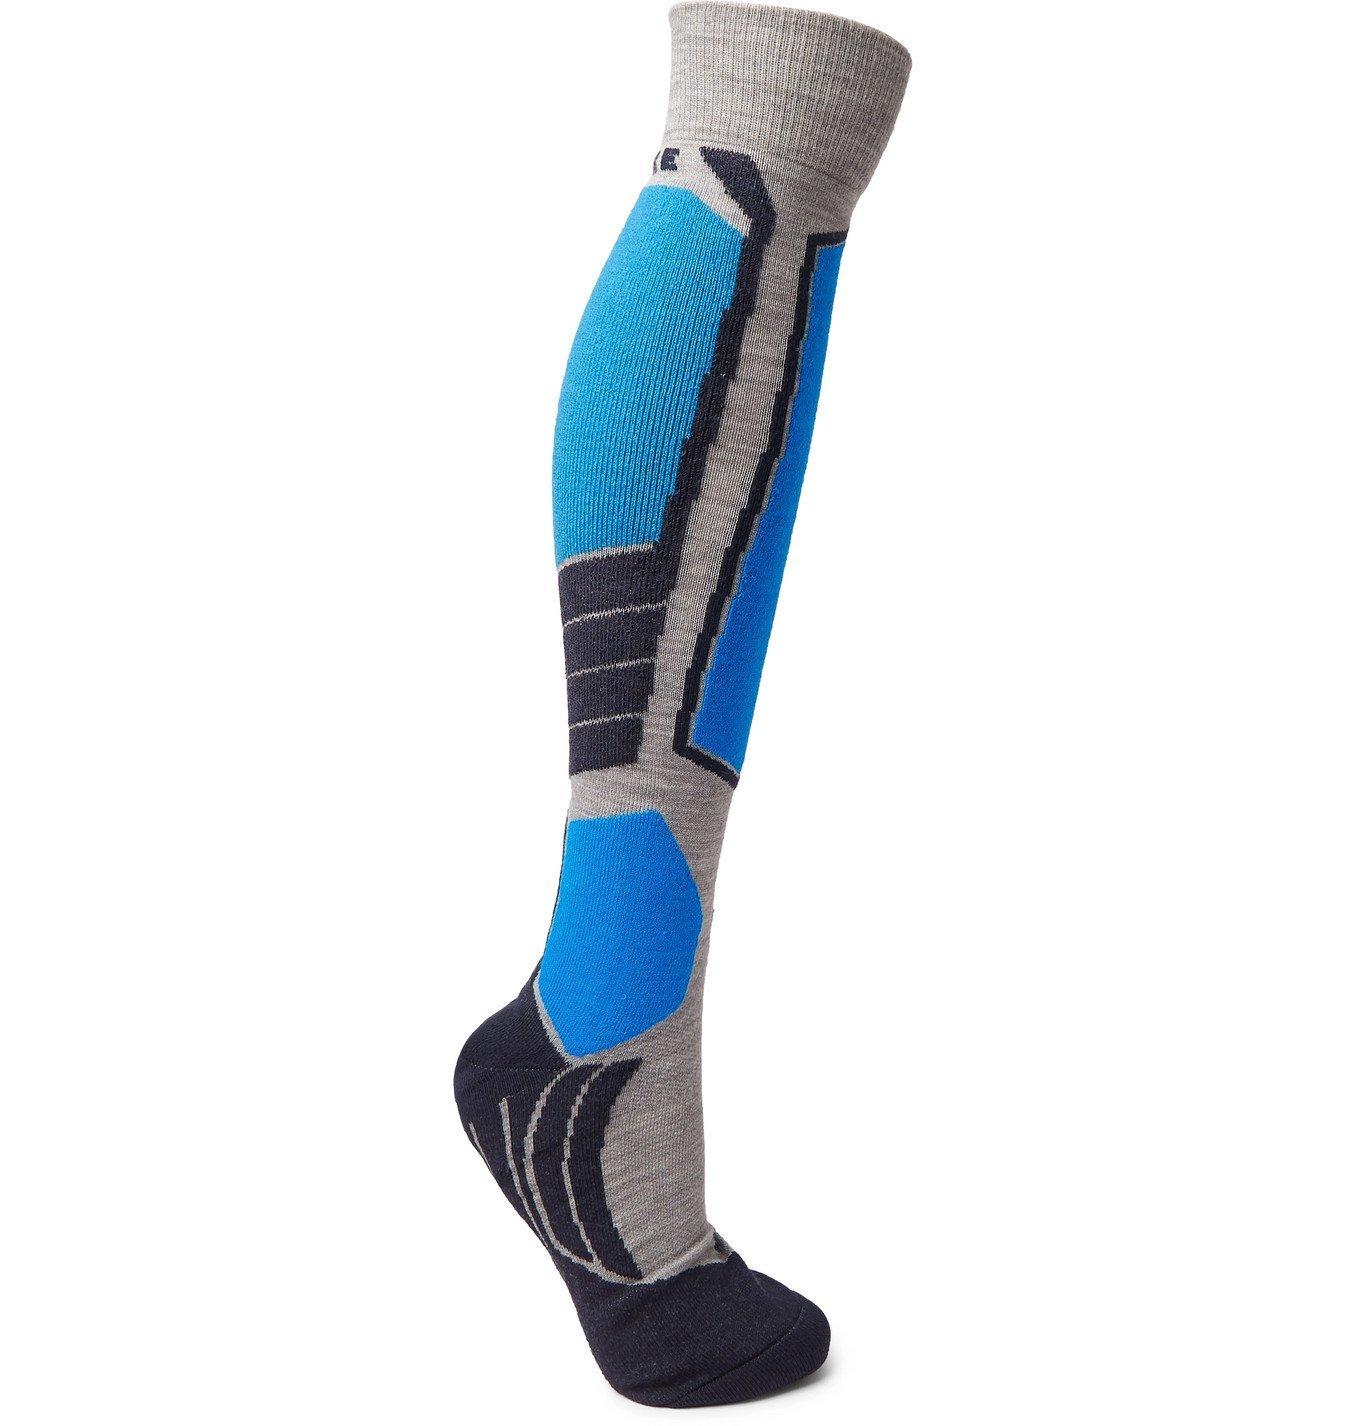 Photo: FALKE Ergonomic Sport System - SK2 Stretch-Knit Socks - Gray